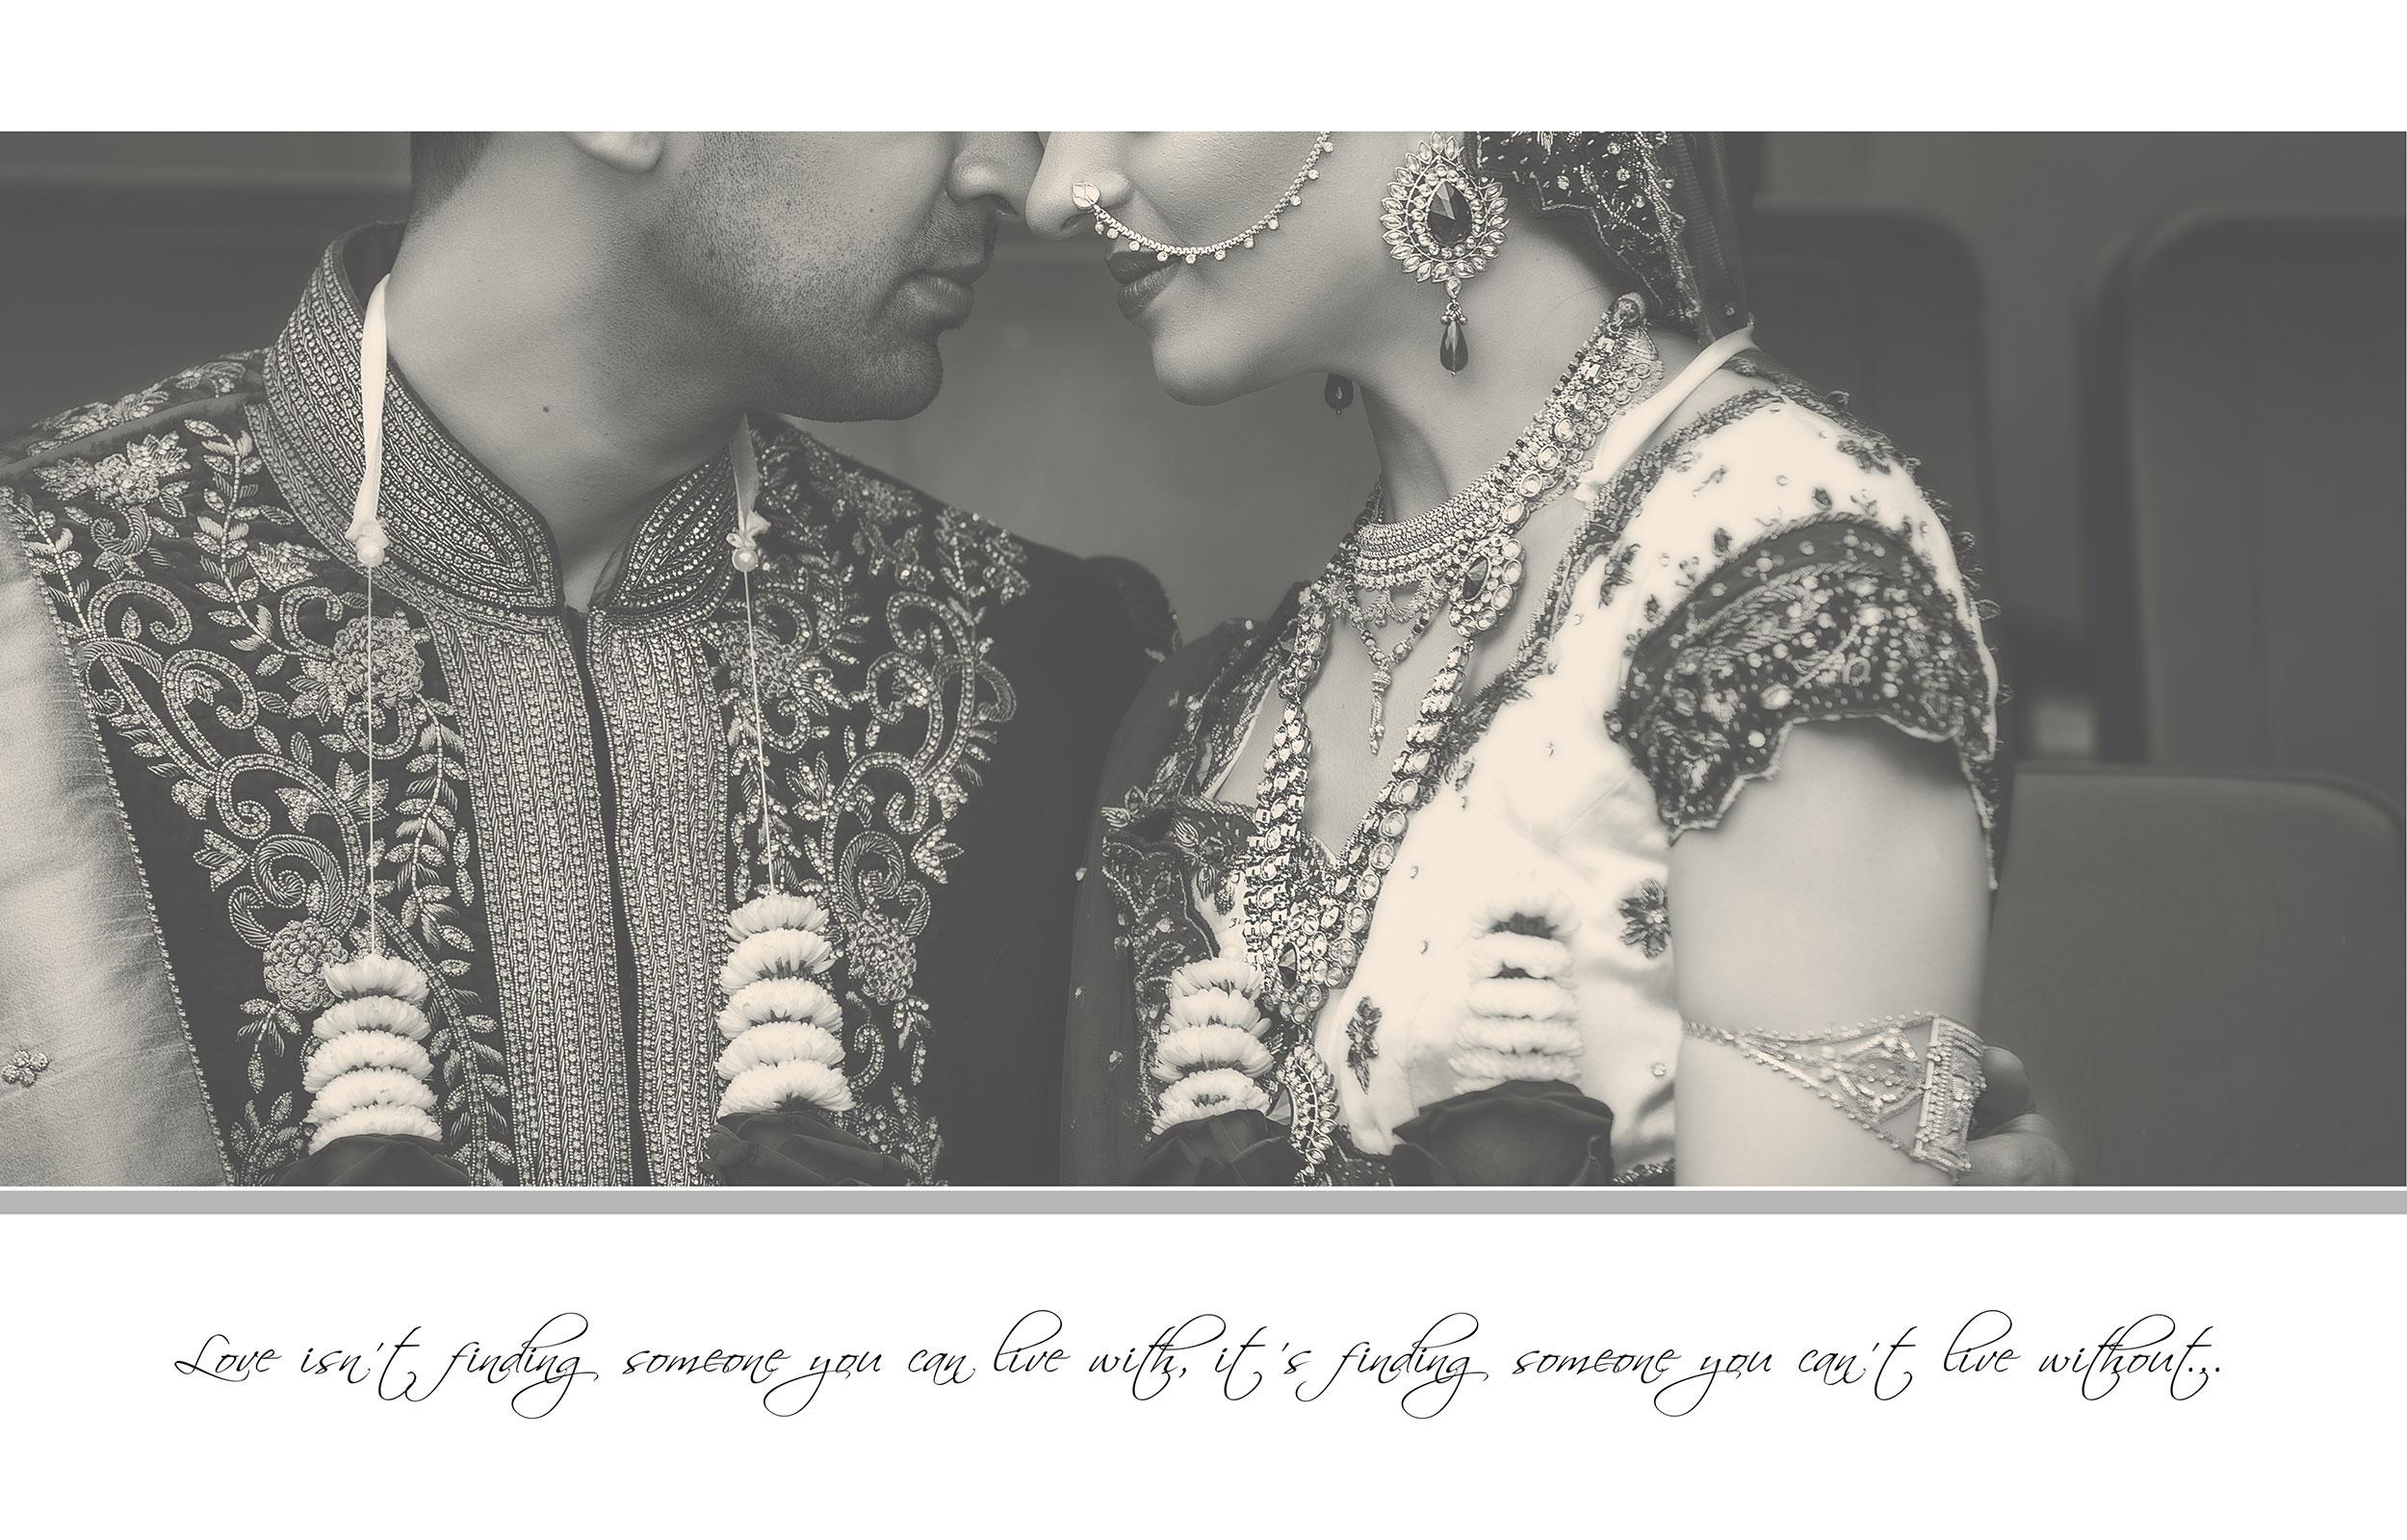 hindu+wedding+photography+investment.jpg